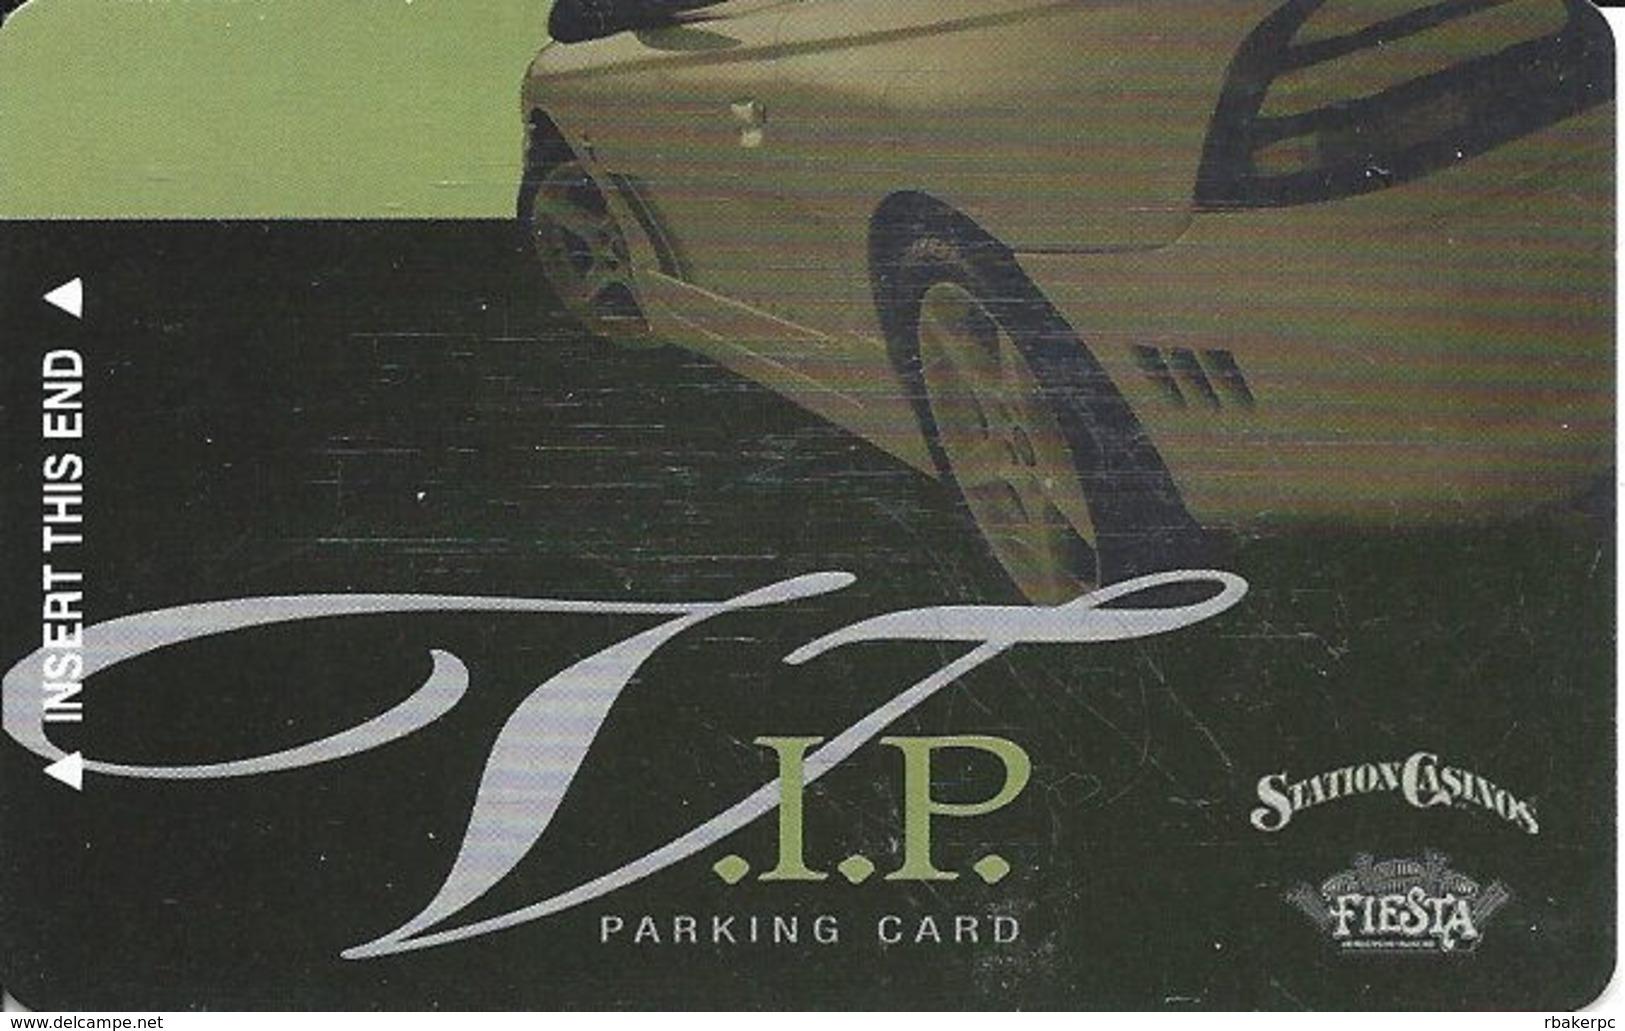 Station Casinos - VIP Parking Card Copyright 2006 - 7 Logos On Back - Casino Cards